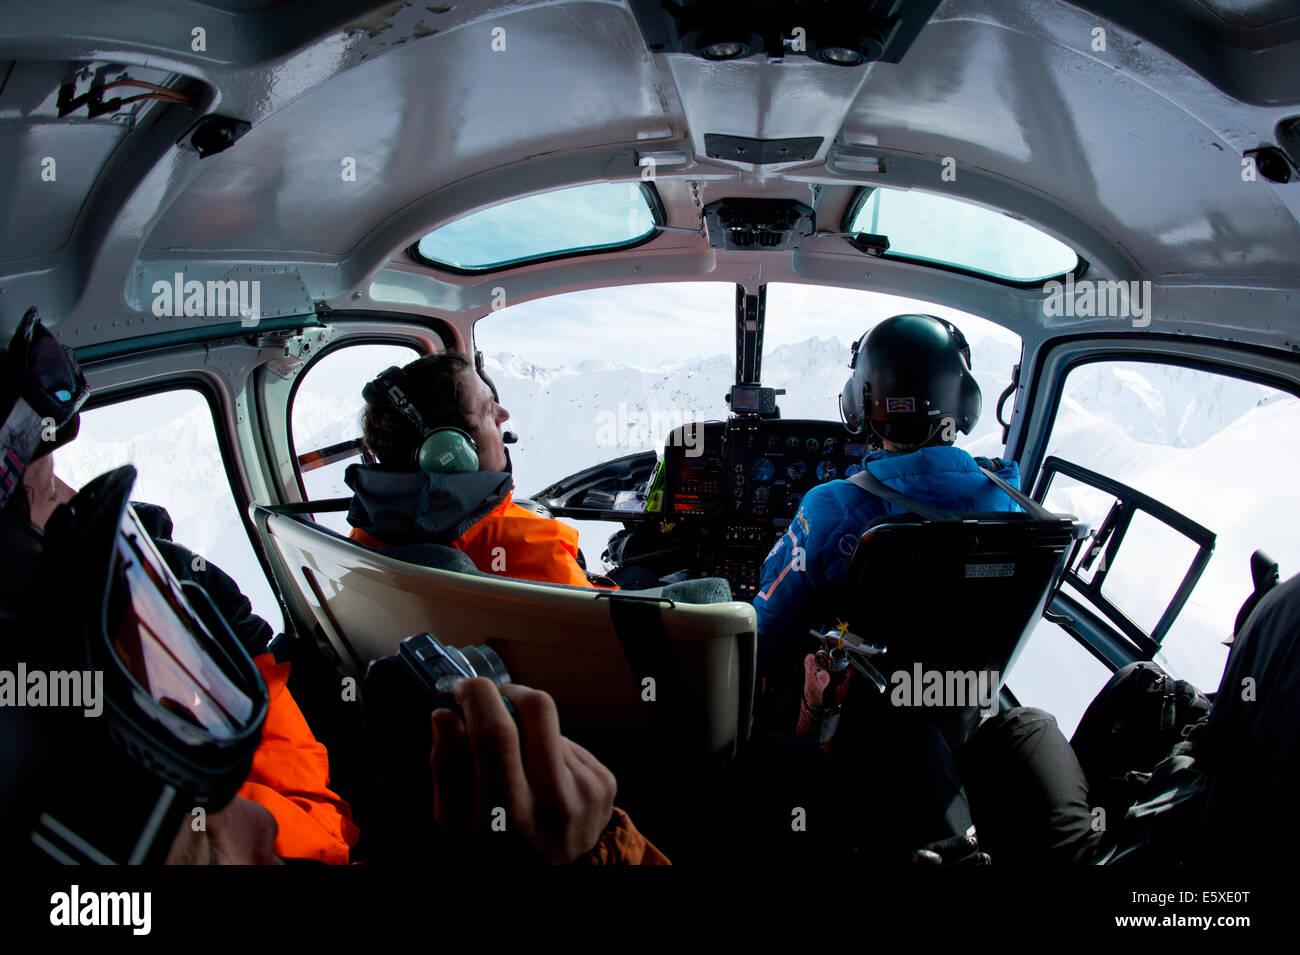 Flying Chugach Powder Guides Helicopter, Girdwood, Alaska. - Stock Image